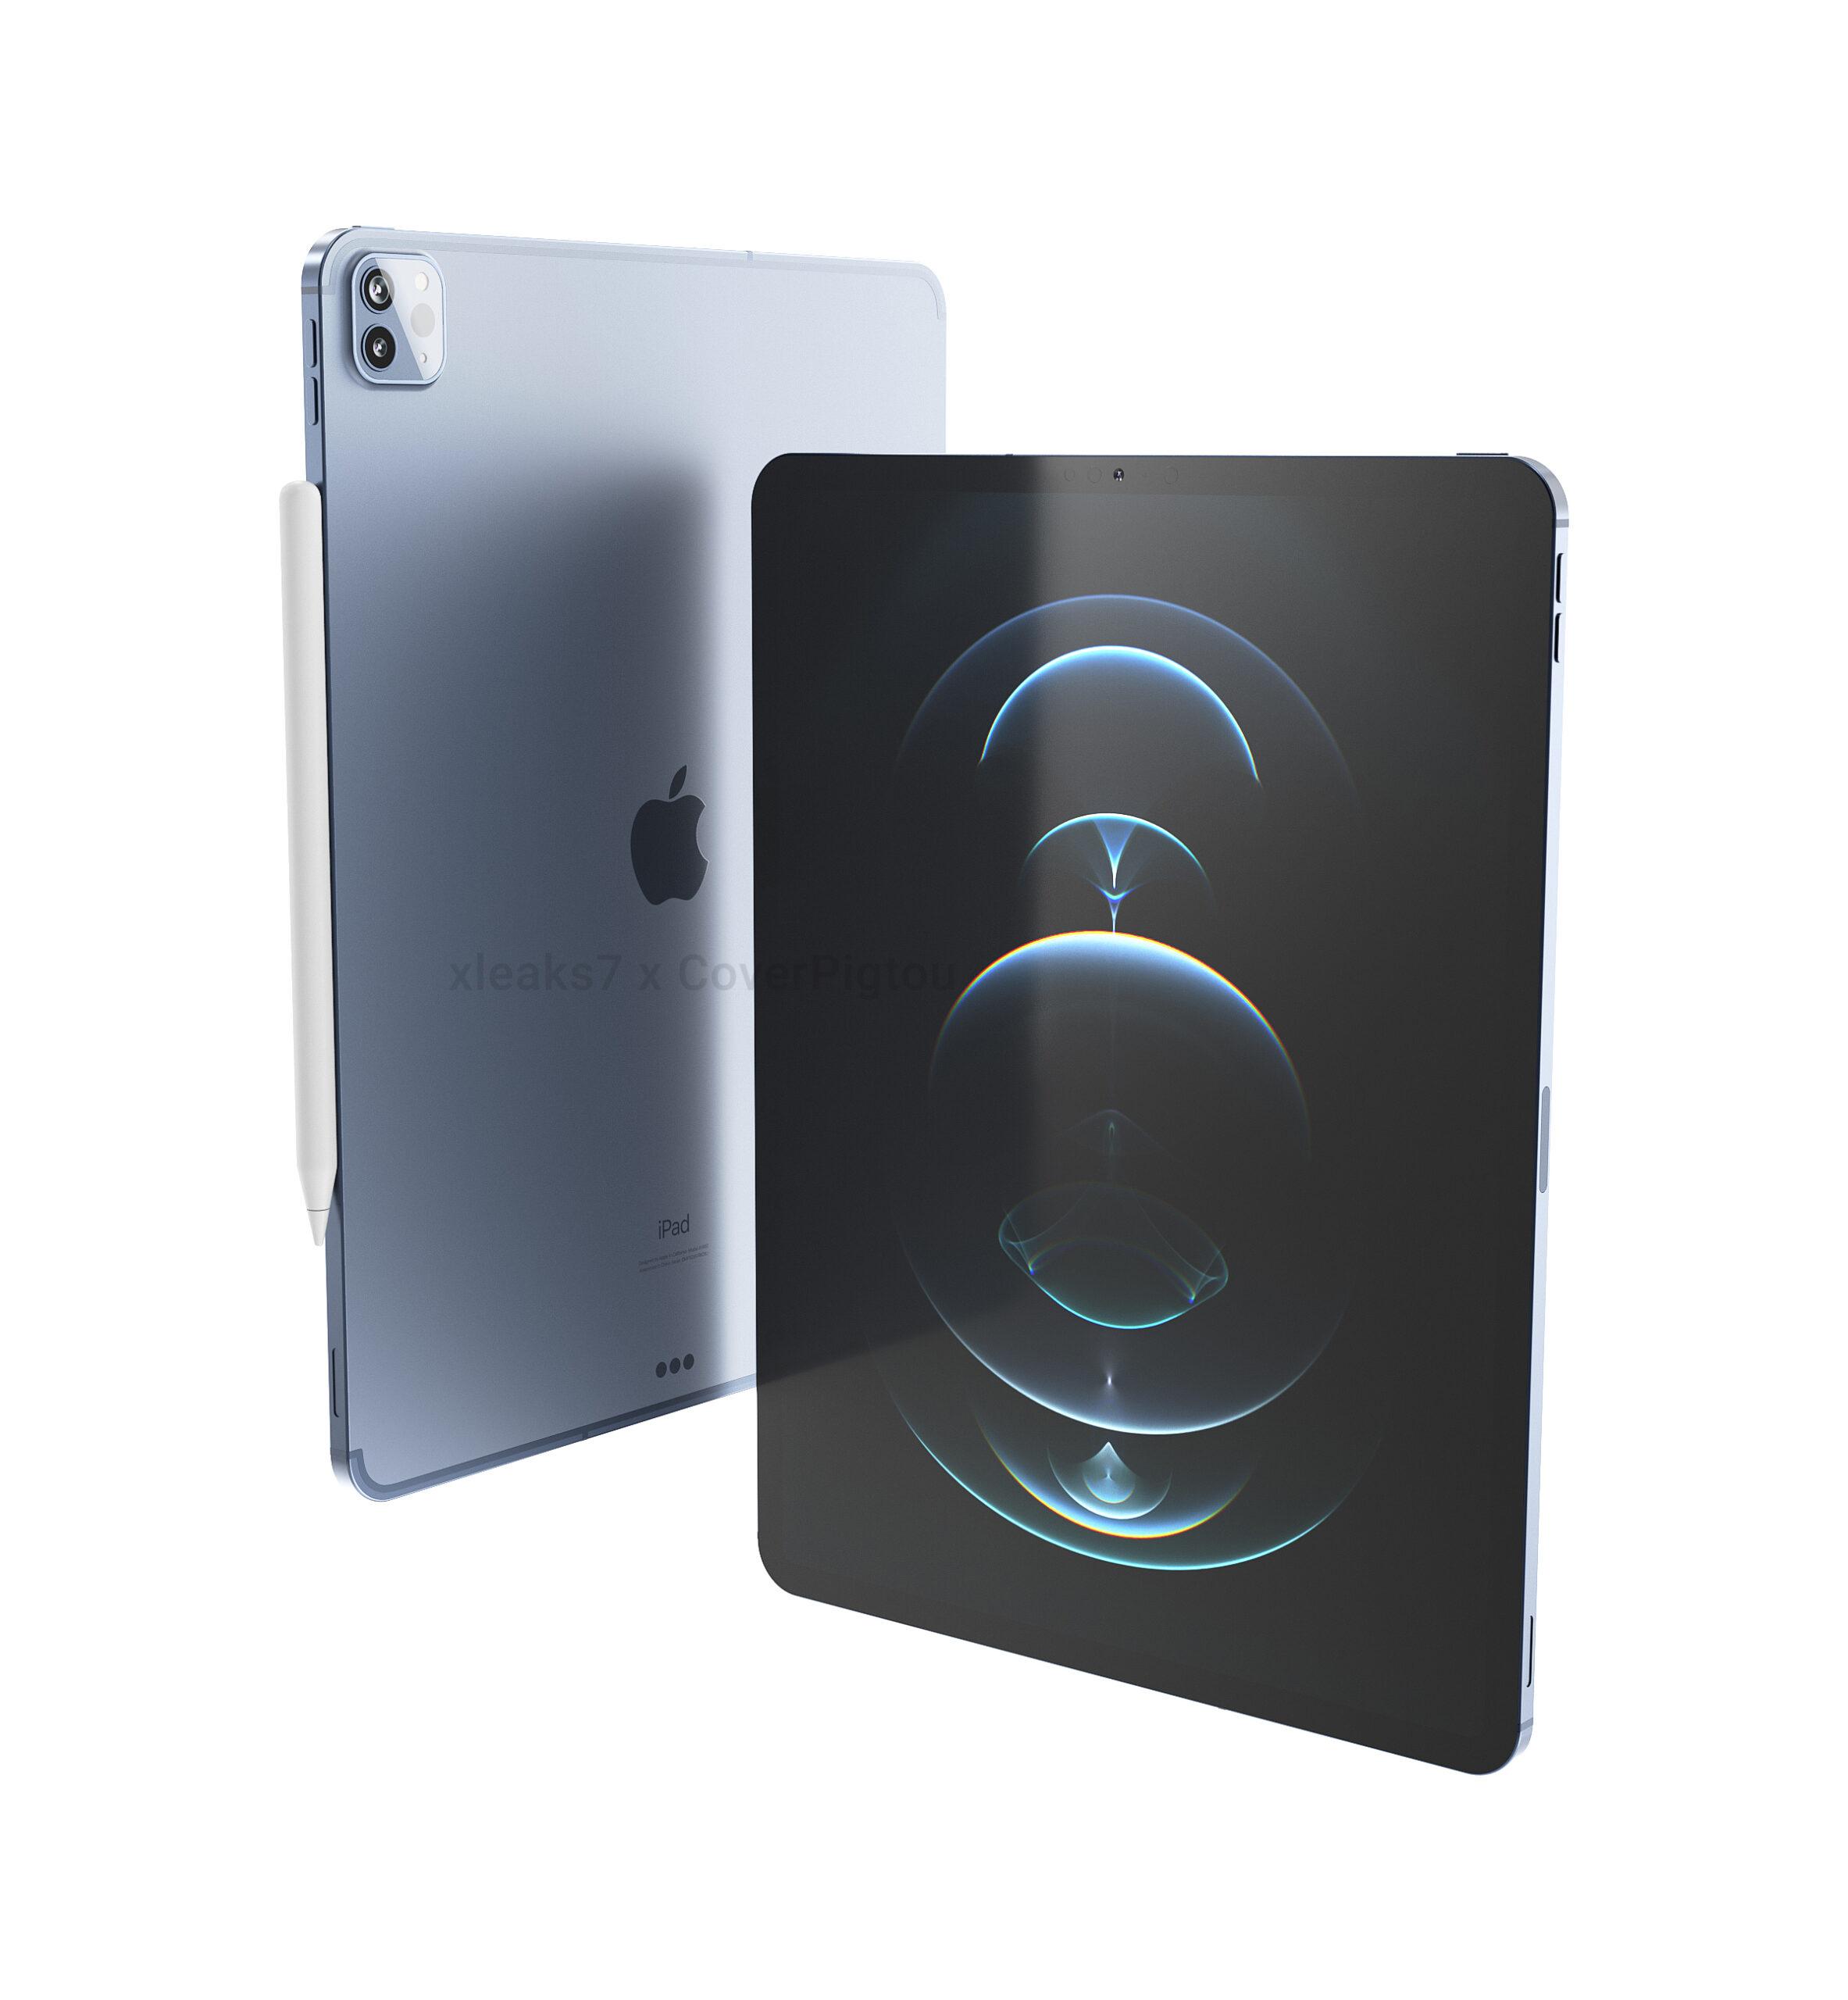 2021 iPad Pro Design Bears Striking Resemblance to 2020 ...